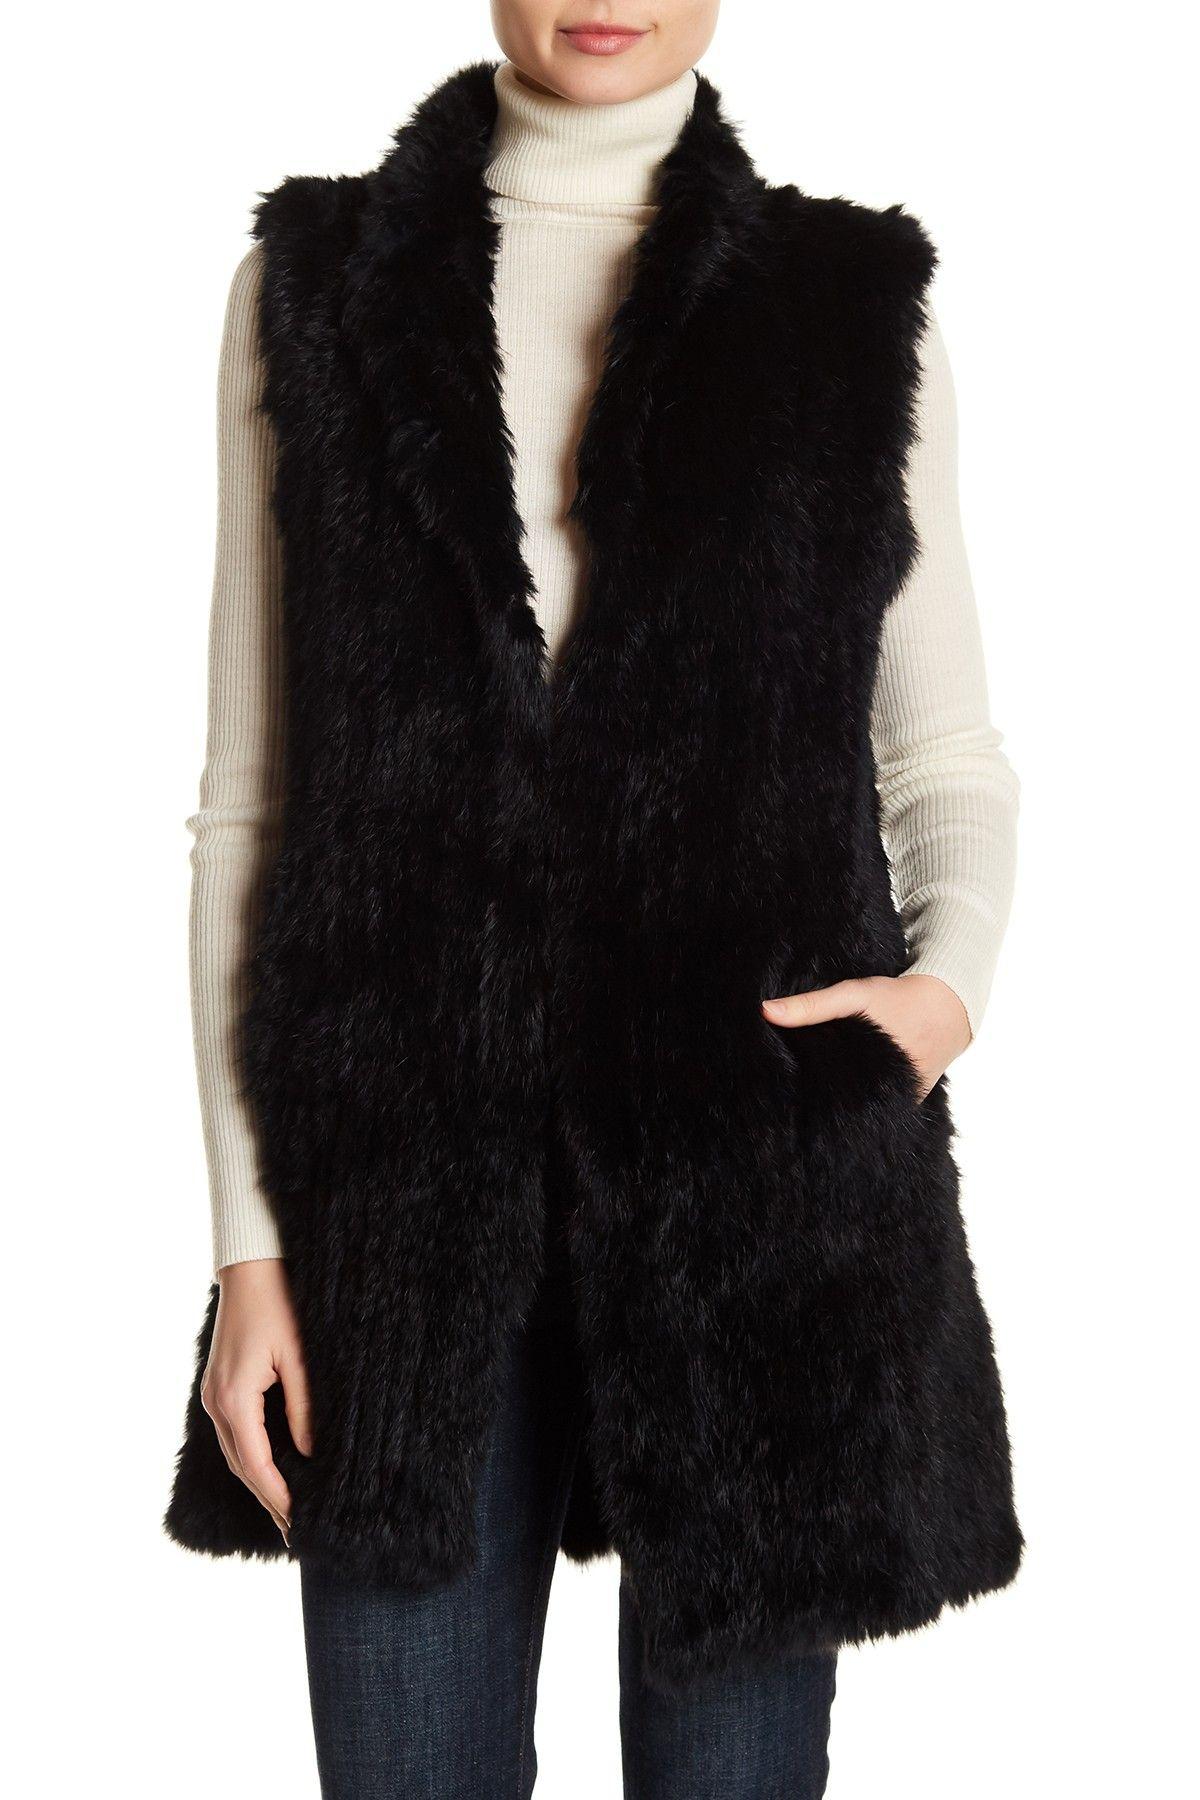 e999ed017 Long Genuine Dyed Rabbit Fur Vest Rabbit Fur Vest, Nordstrom Rack, Jackets,  Fur